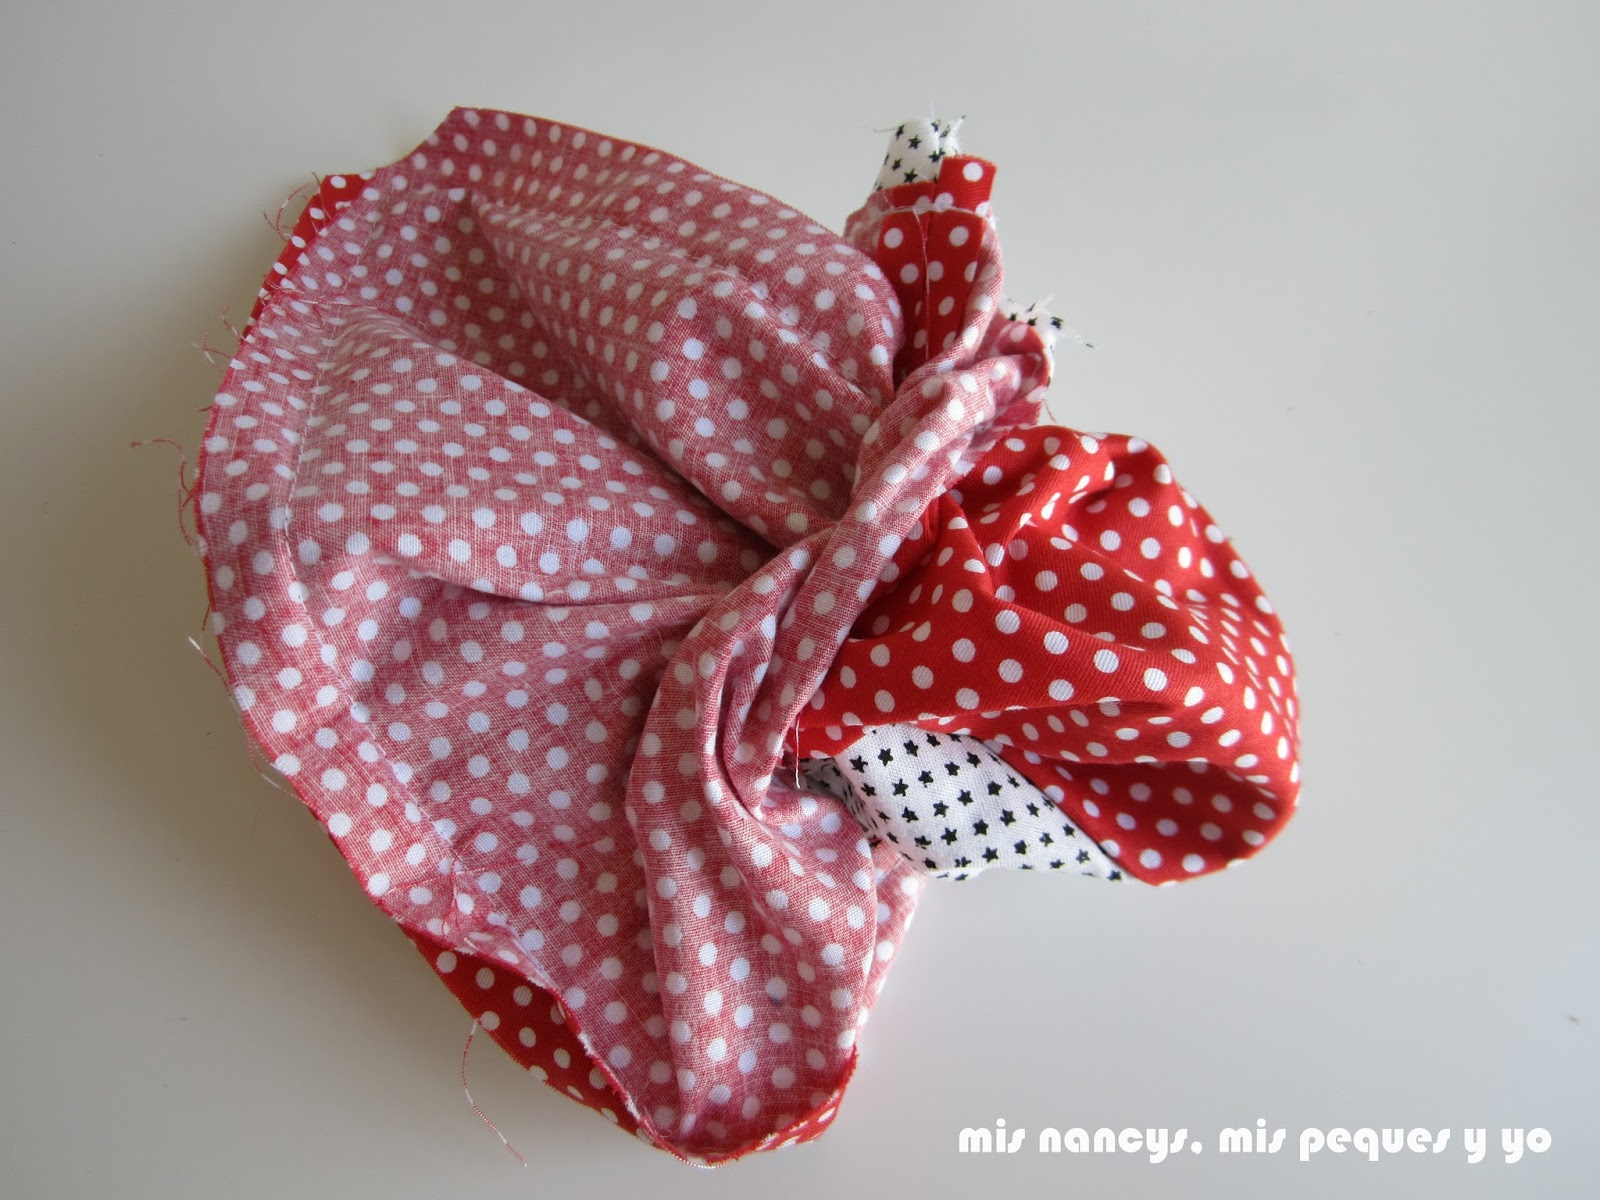 mis nancys, mis peques y yo, tutorial bolsitas de Navidad reversibles, girar la bolsa